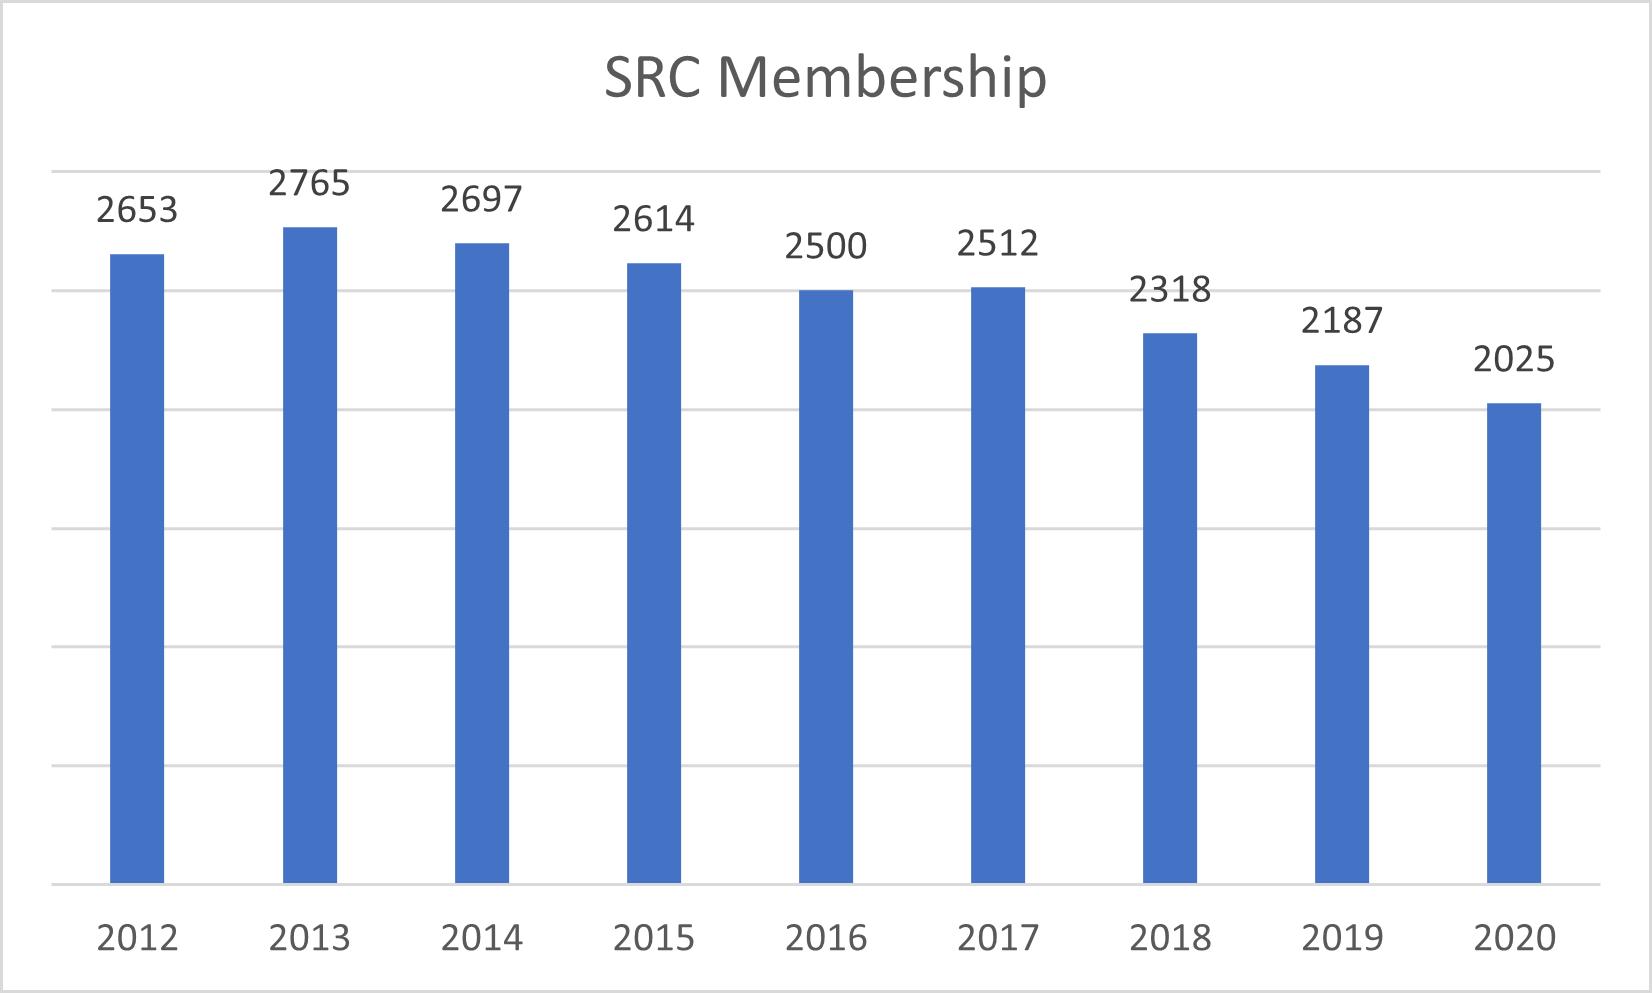 SRCMembershhip Chart 102520